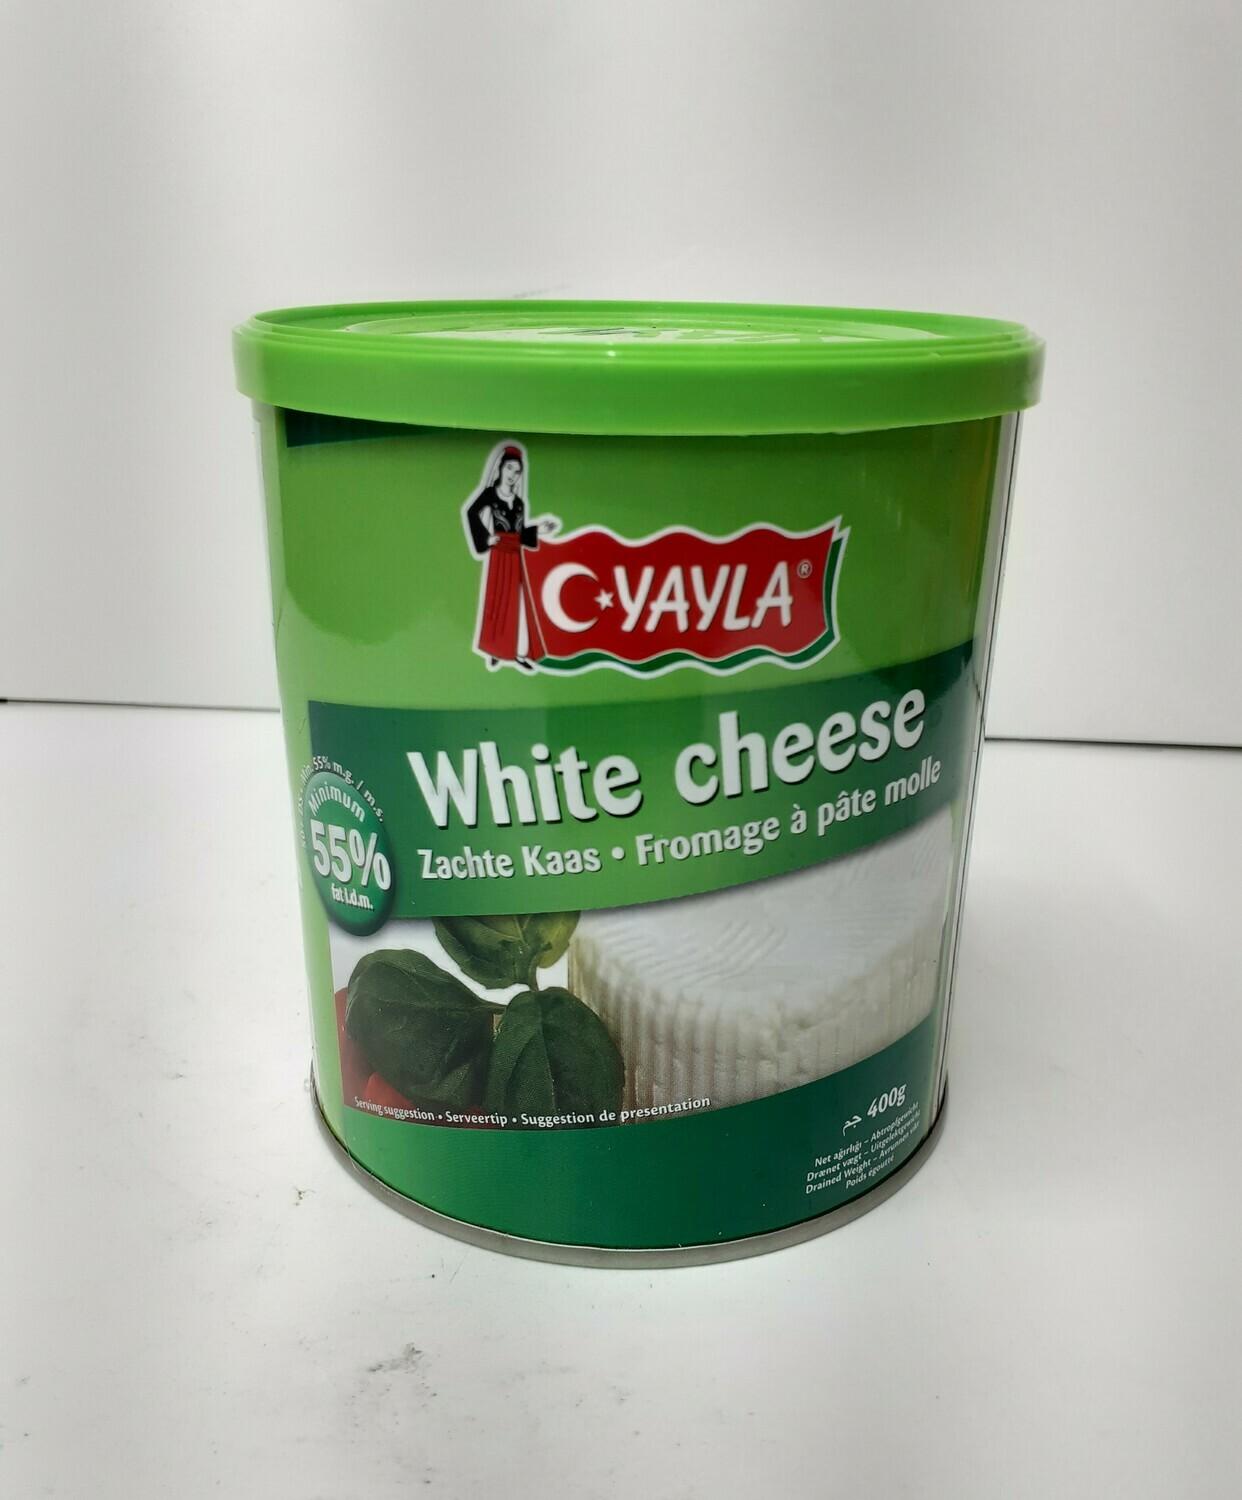 White Cheese C YAYLA 400 g